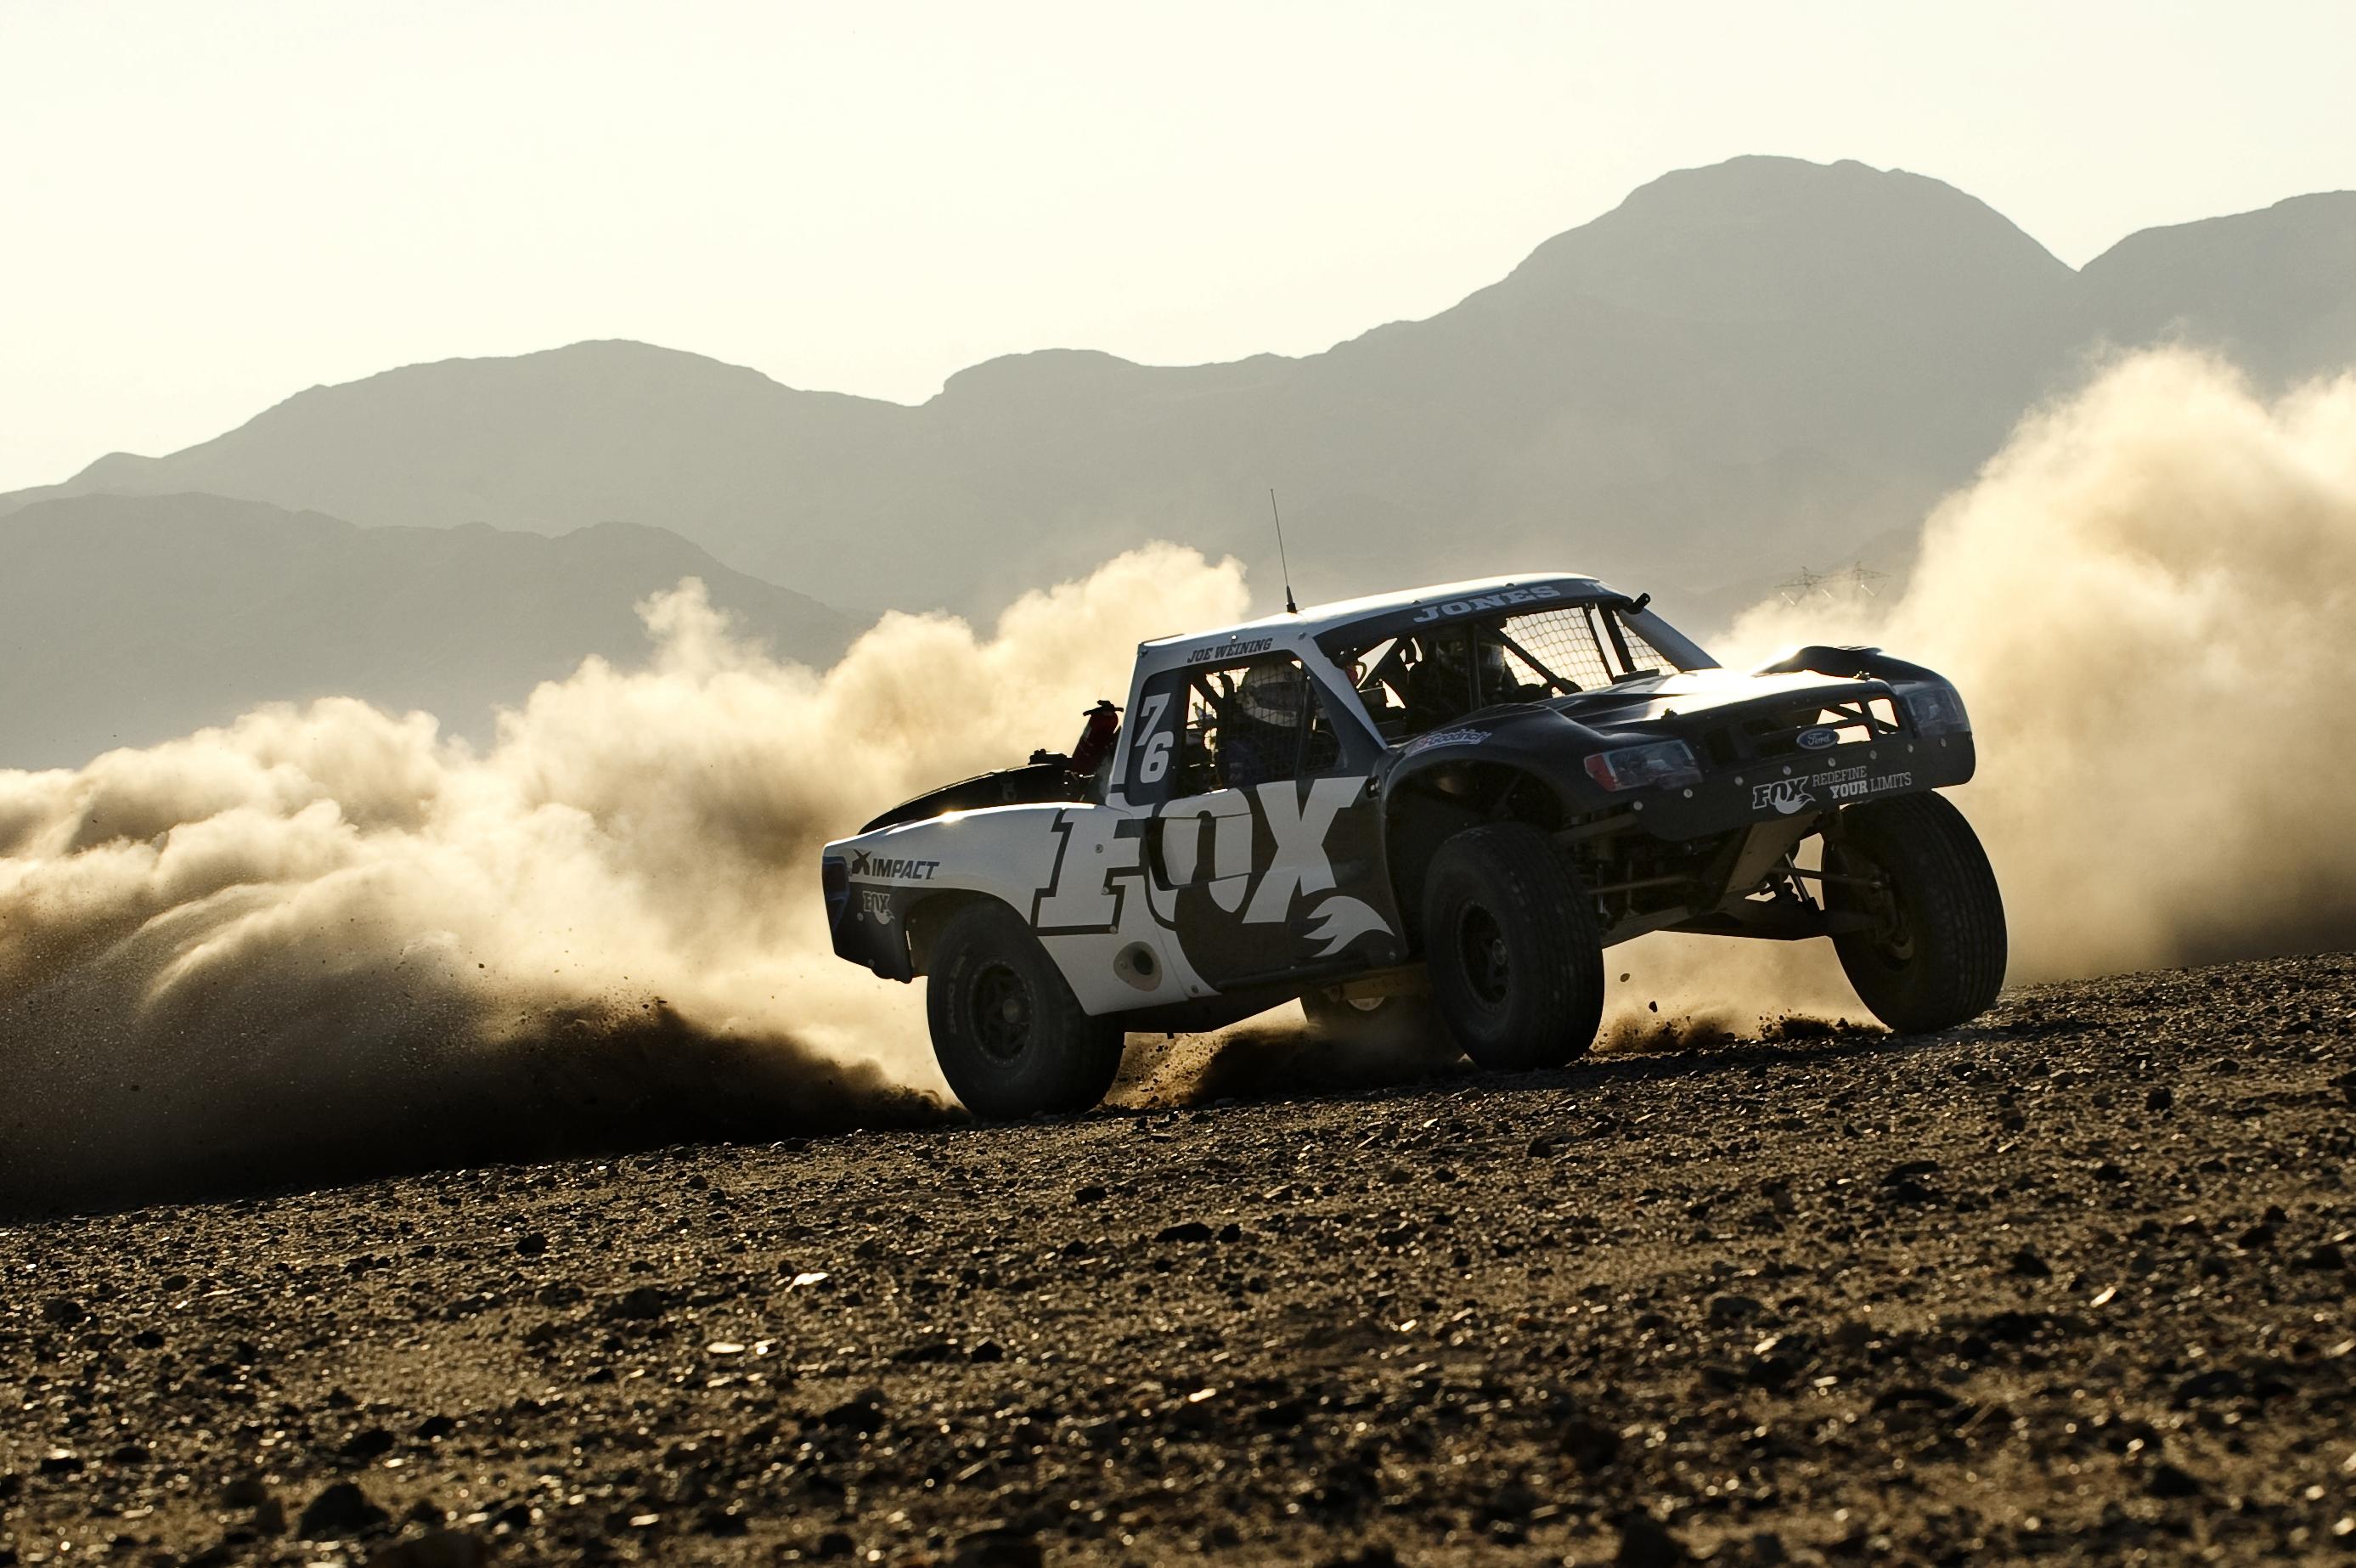 Cool Race Car Hd Wallpapers Trophy Truck Archives Hdwallsource Com